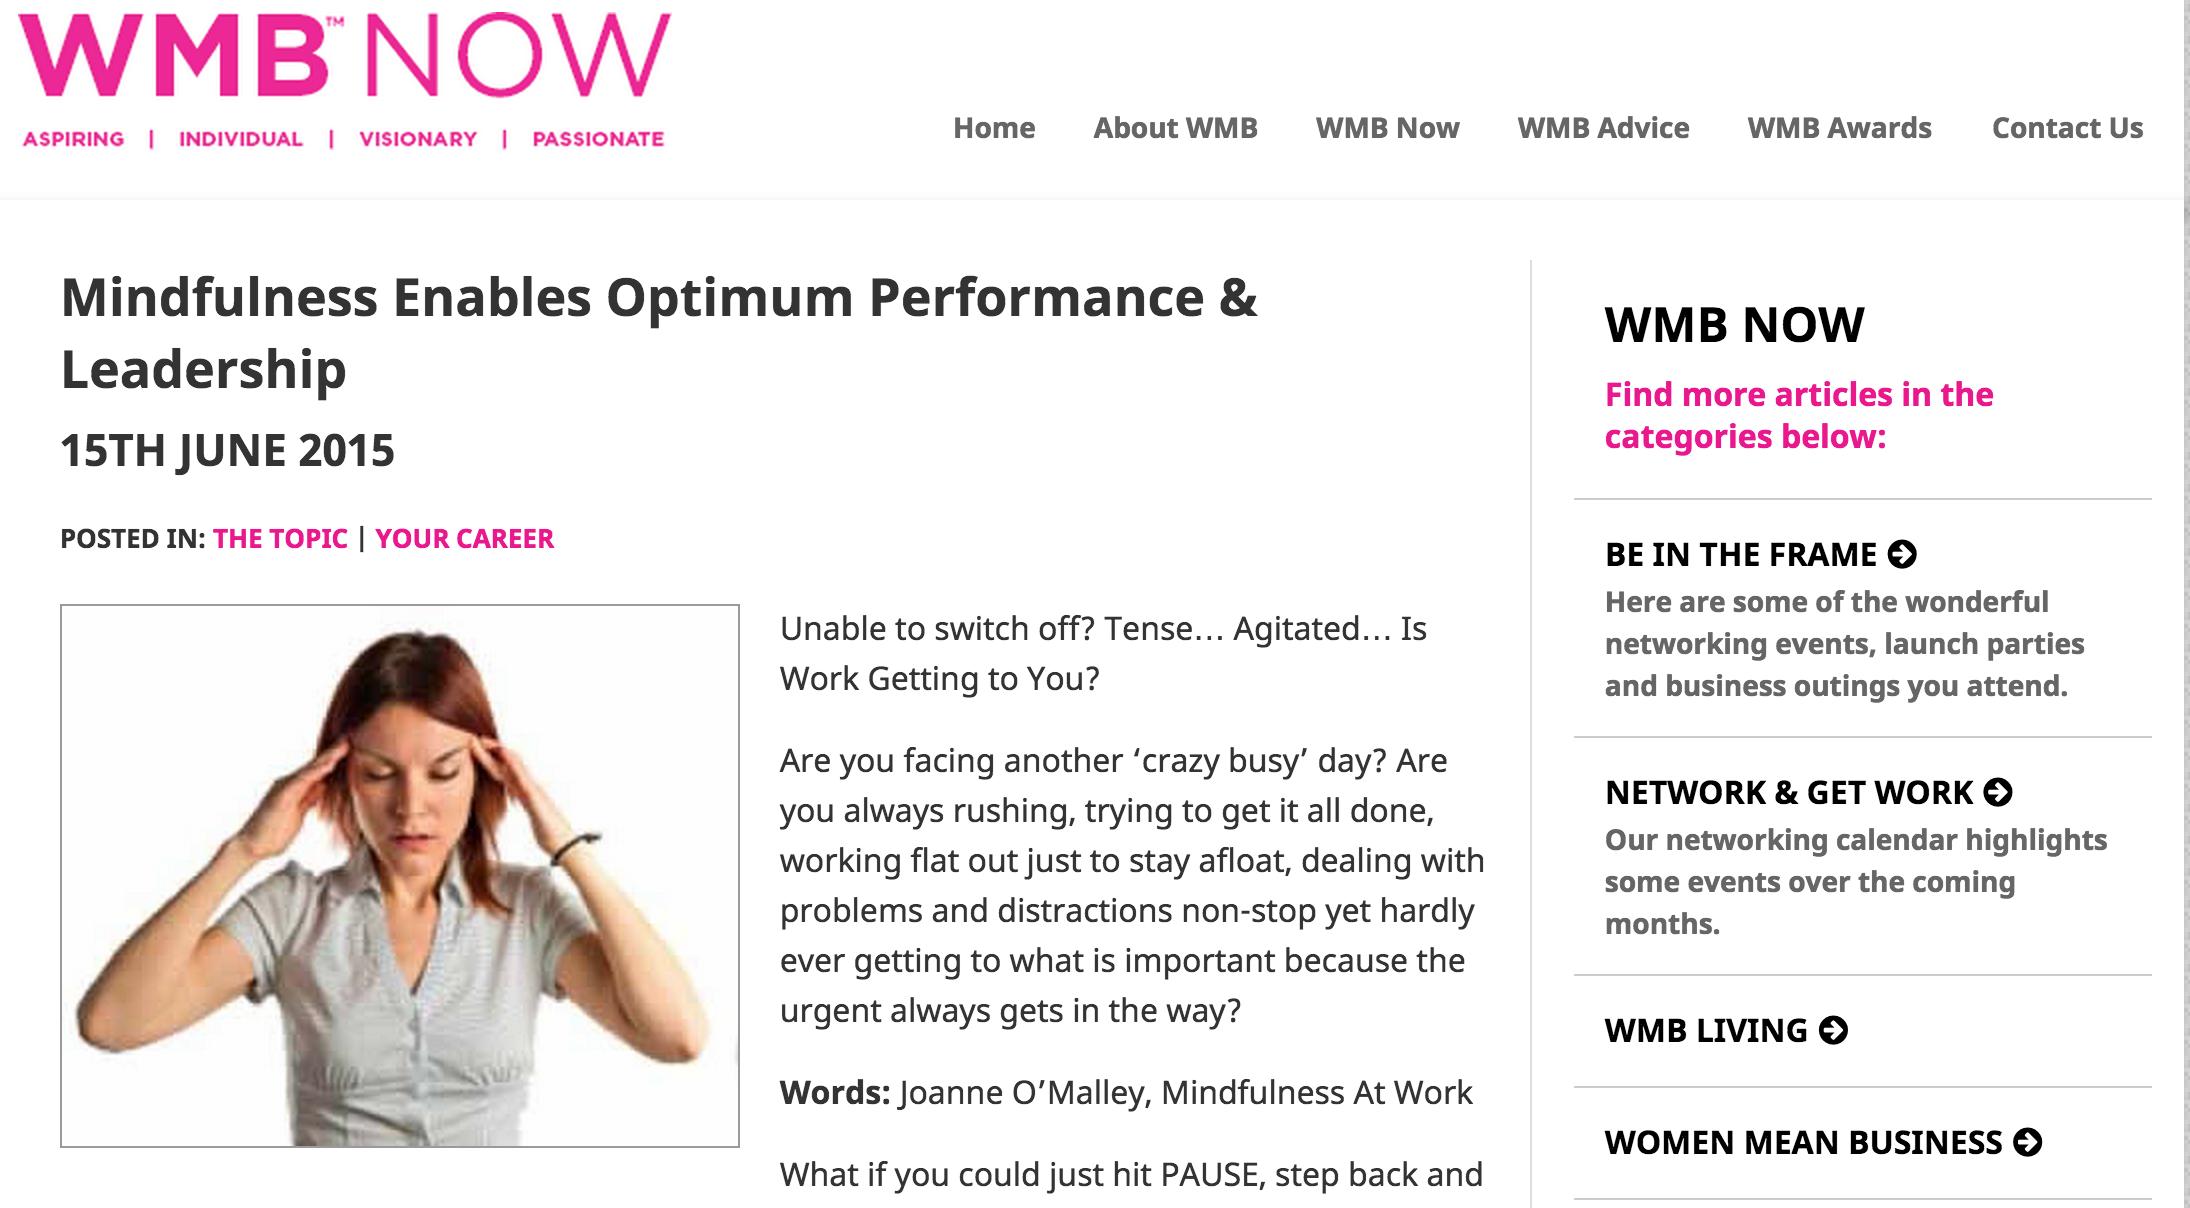 WMB : Mindfulness enables optimum performance